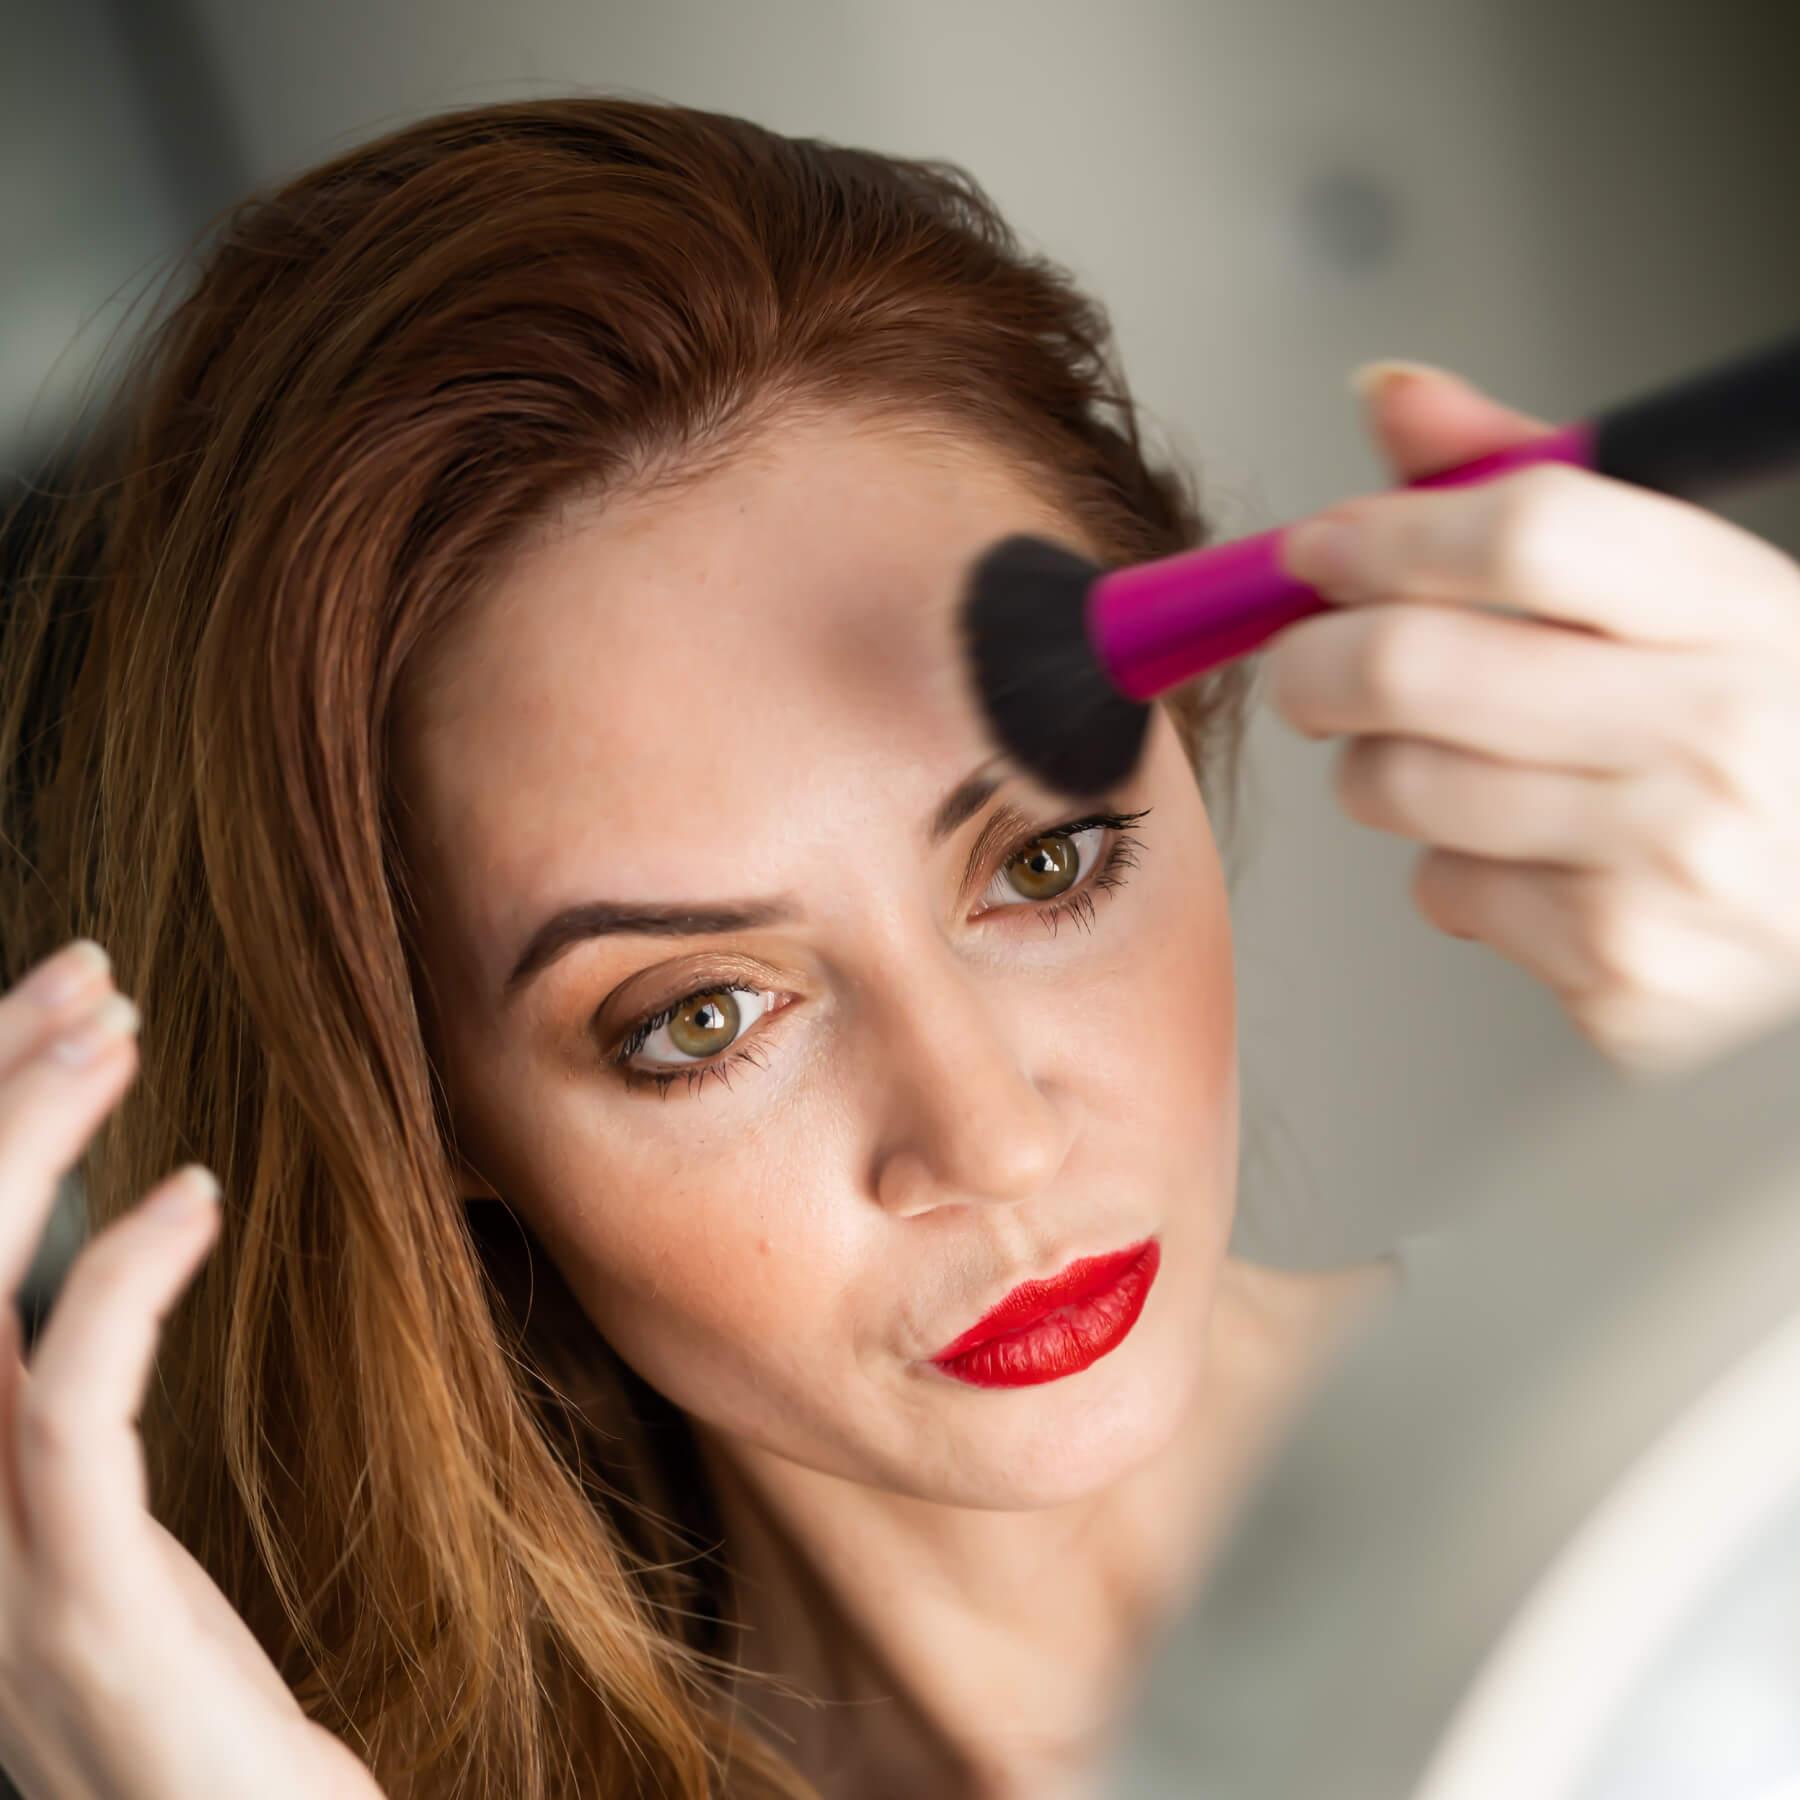 Woman applying make-up with powder brush